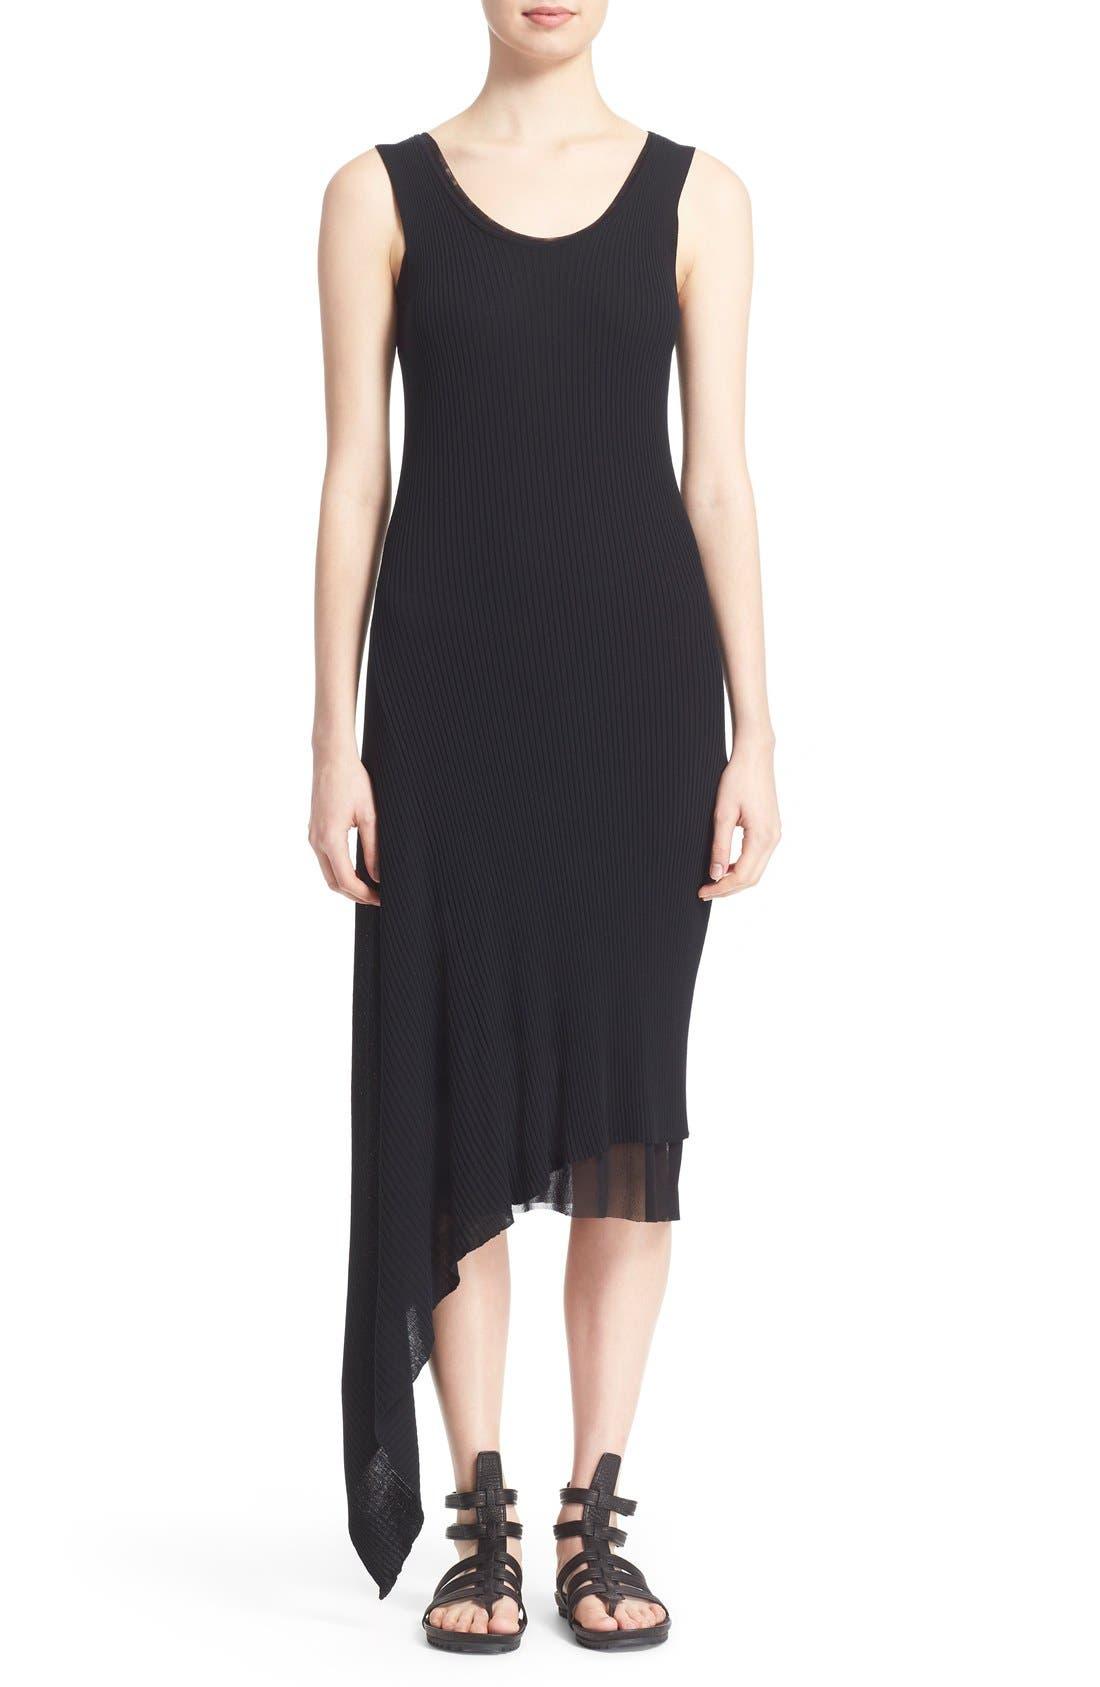 Alternate Image 1 Selected - Fuzzi Asymmetrical Rib Knit Tank Dress